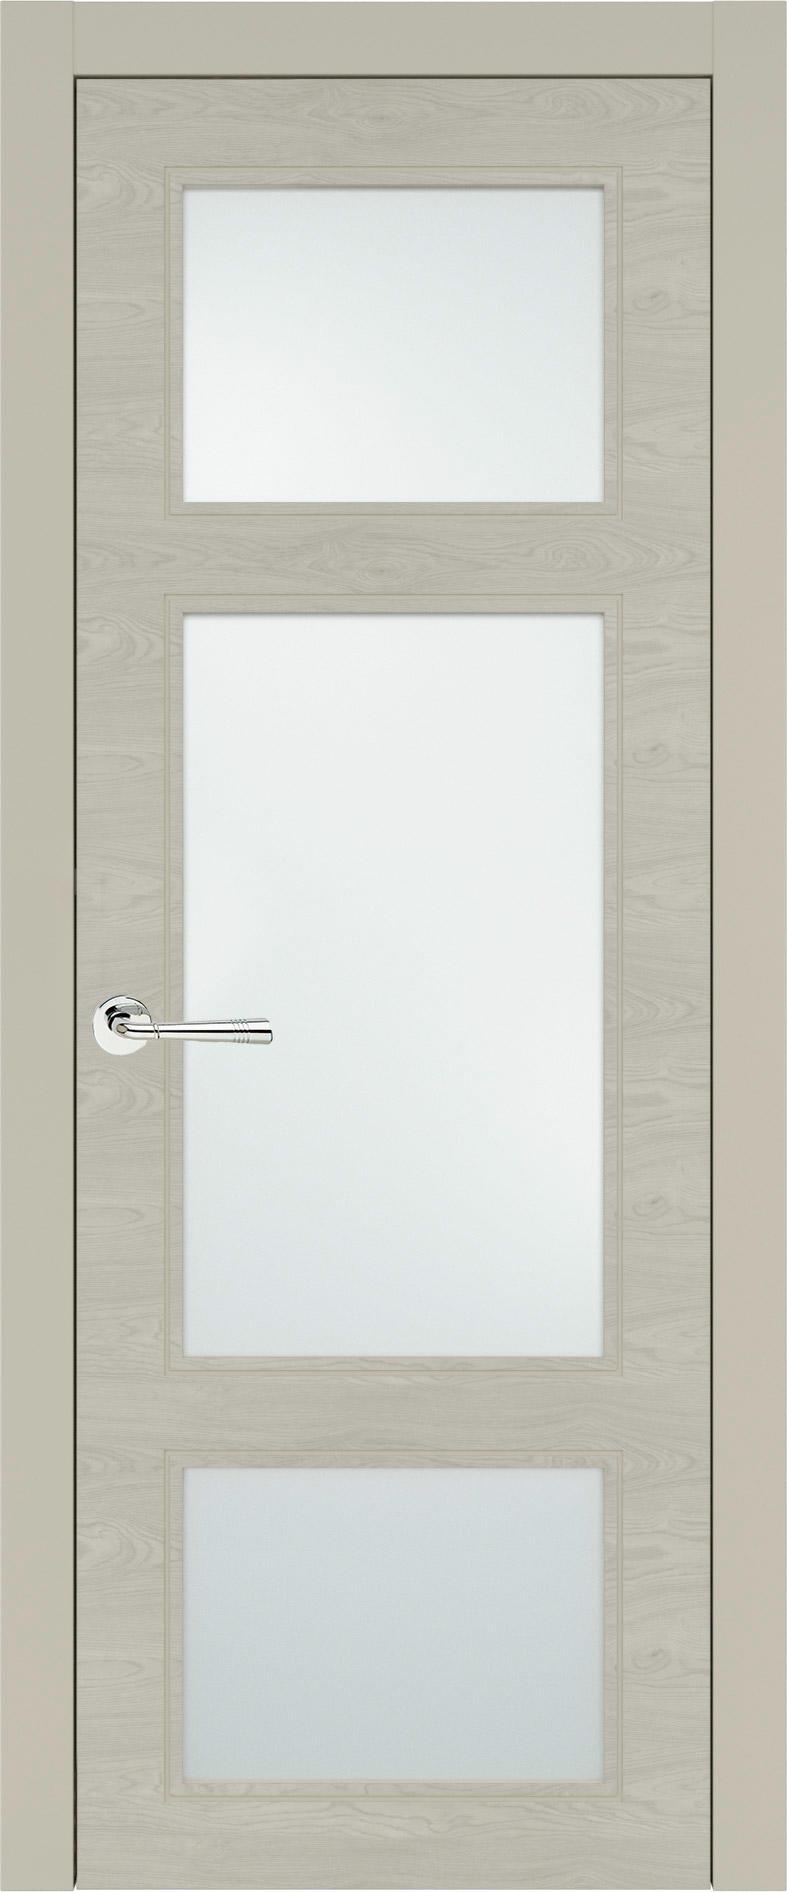 Siena Neo Classic цвет - Серо-оливковая эмаль по шпону (RAL 7032) Со стеклом (ДО)